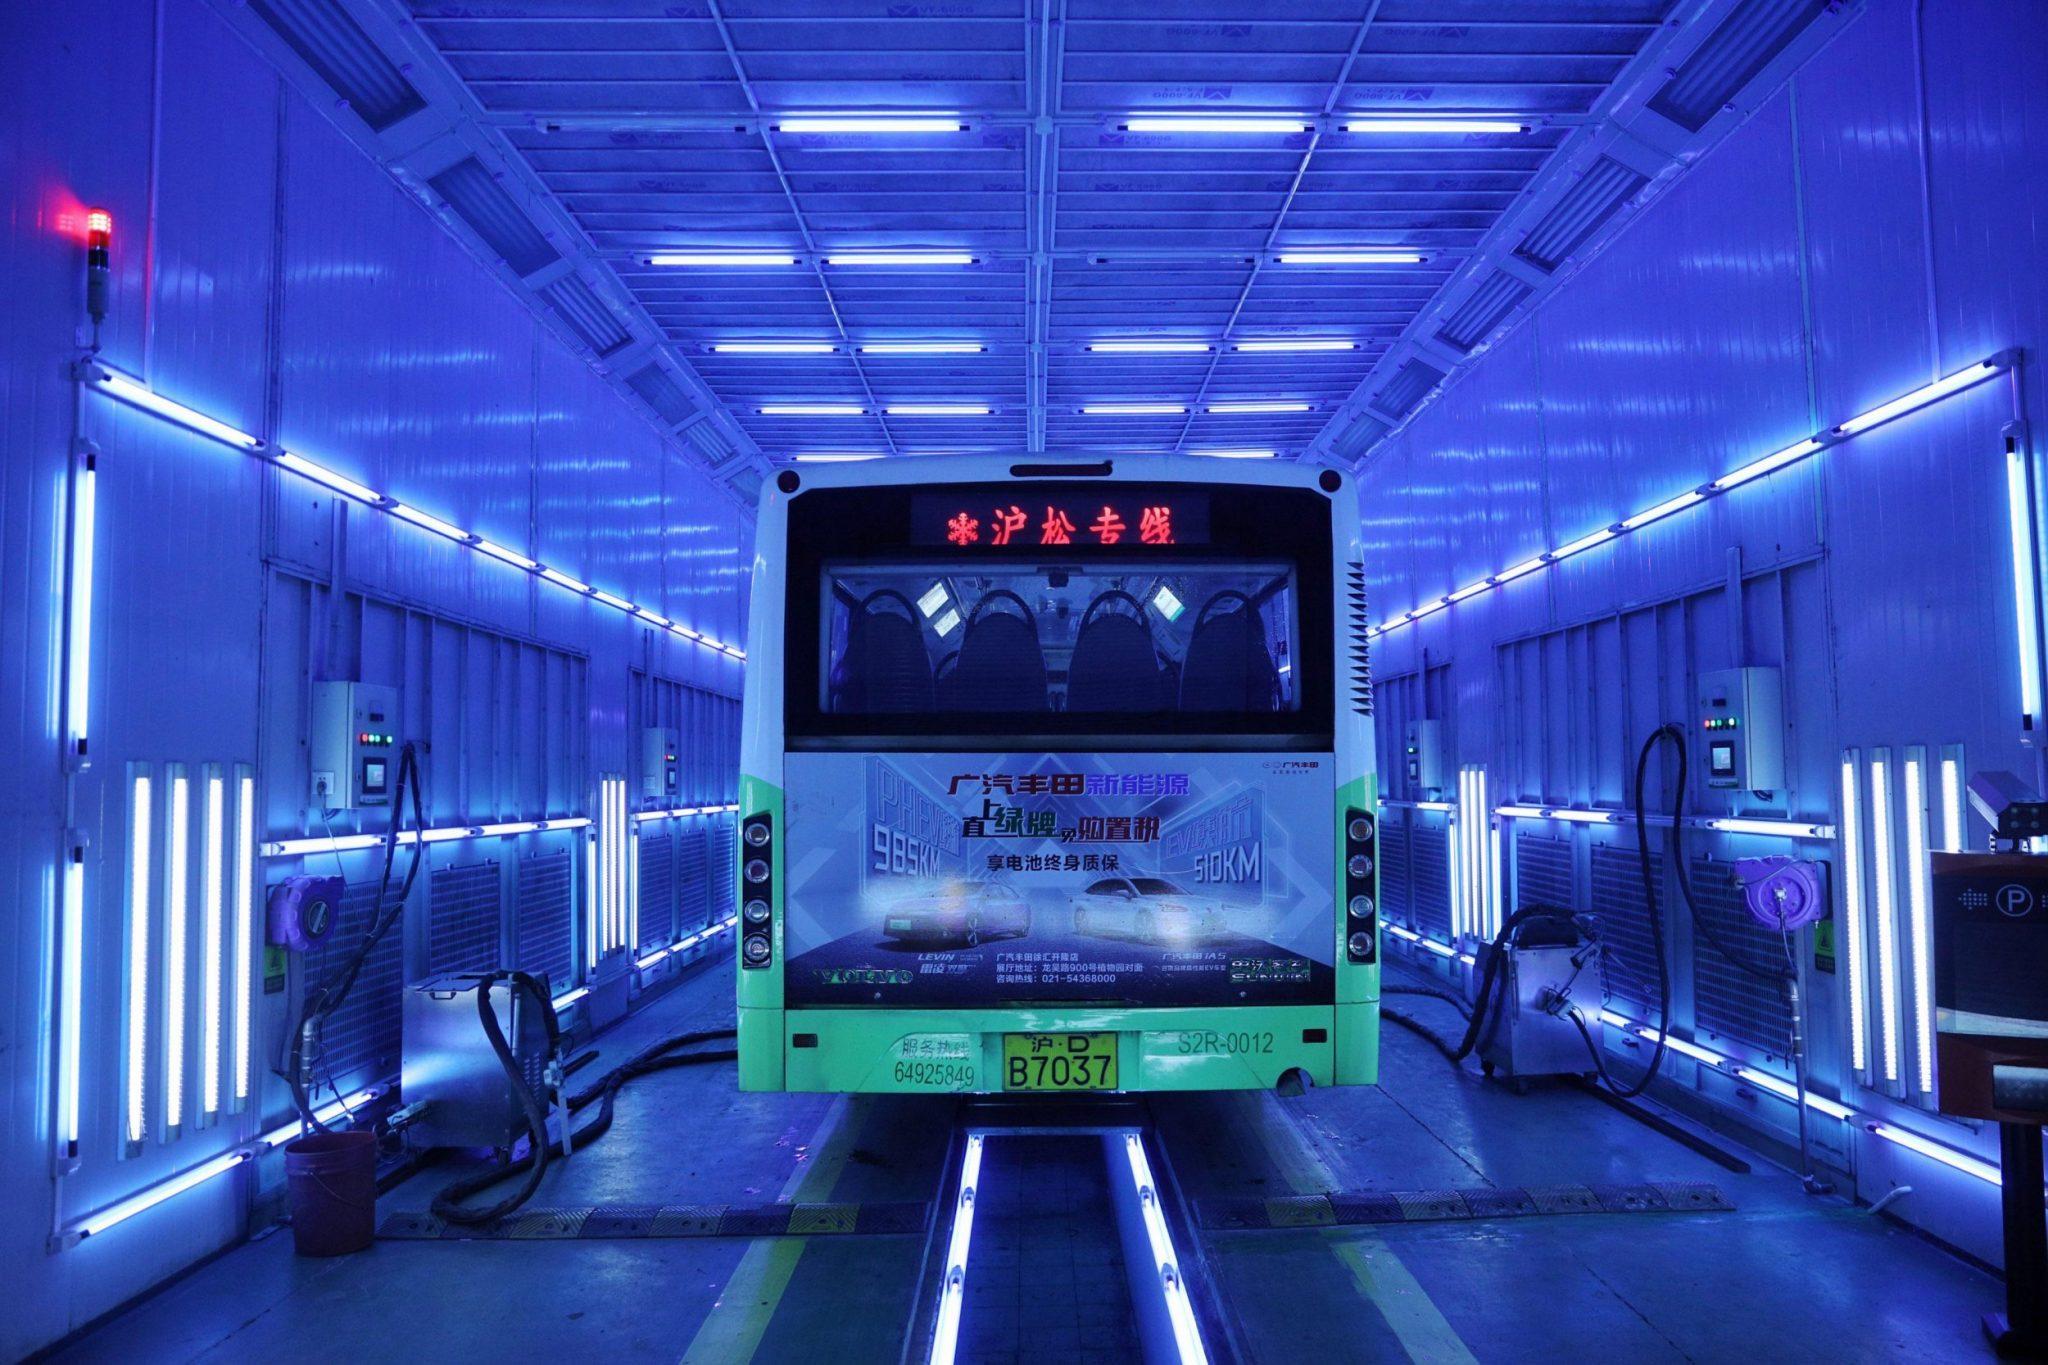 UVC Light disinfecting bus China